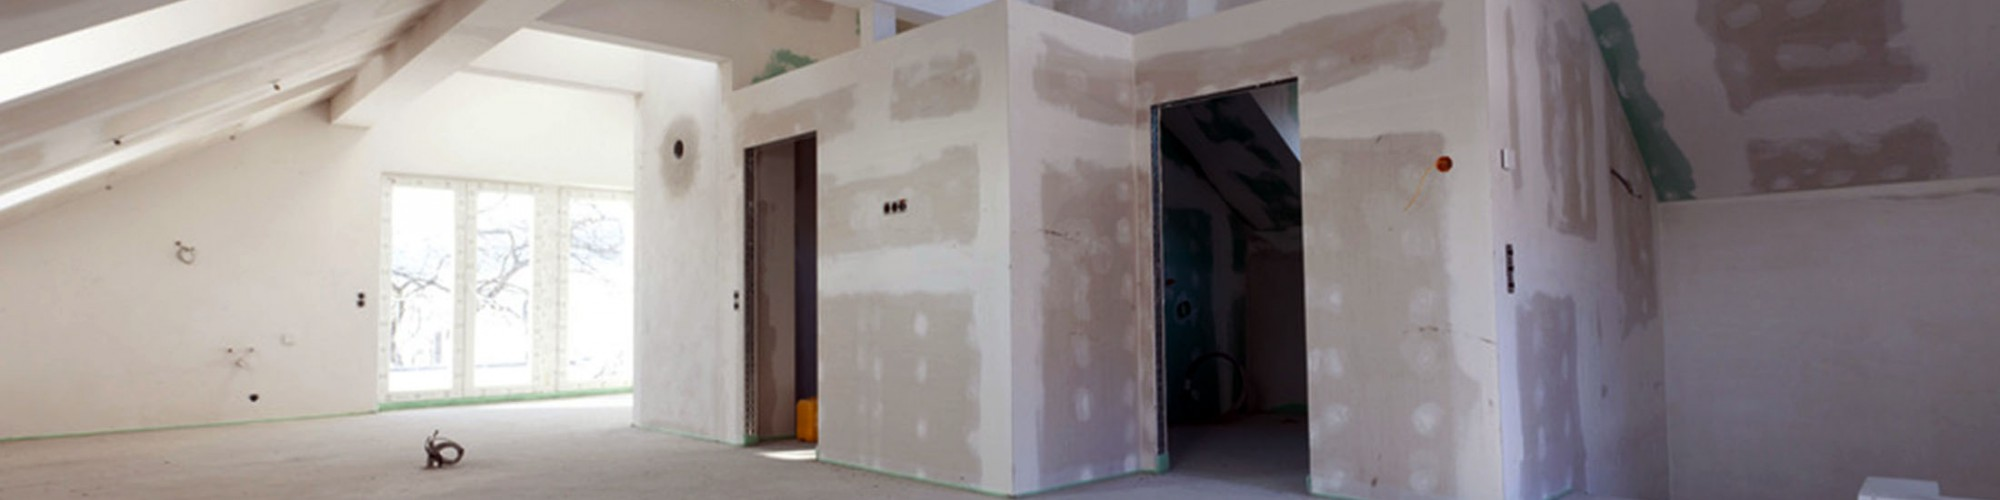 anti schall gmbh meisterbetrieb trockenbau akustikbau. Black Bedroom Furniture Sets. Home Design Ideas